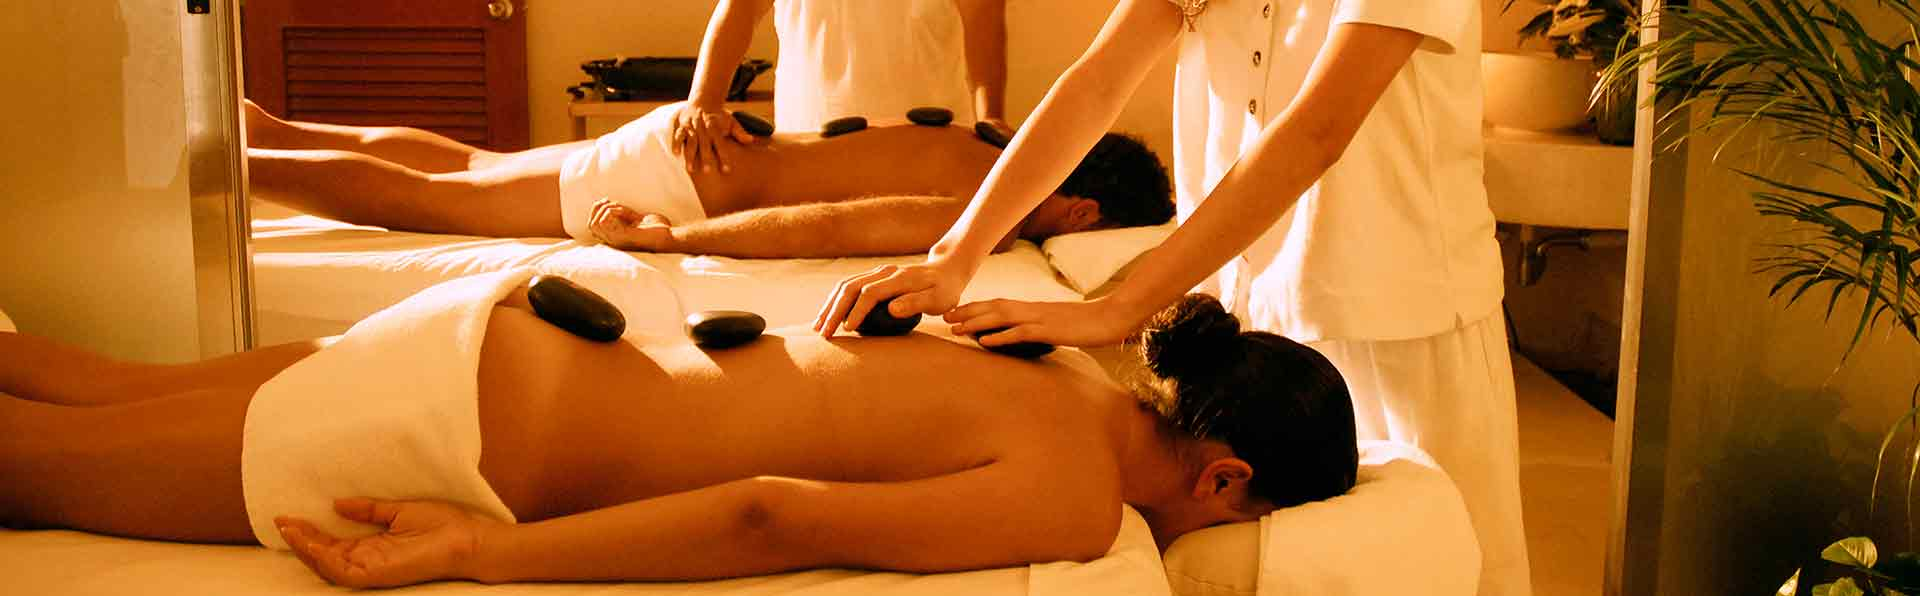 Exotic Spa Massage at Desire Resort Riviera Maya